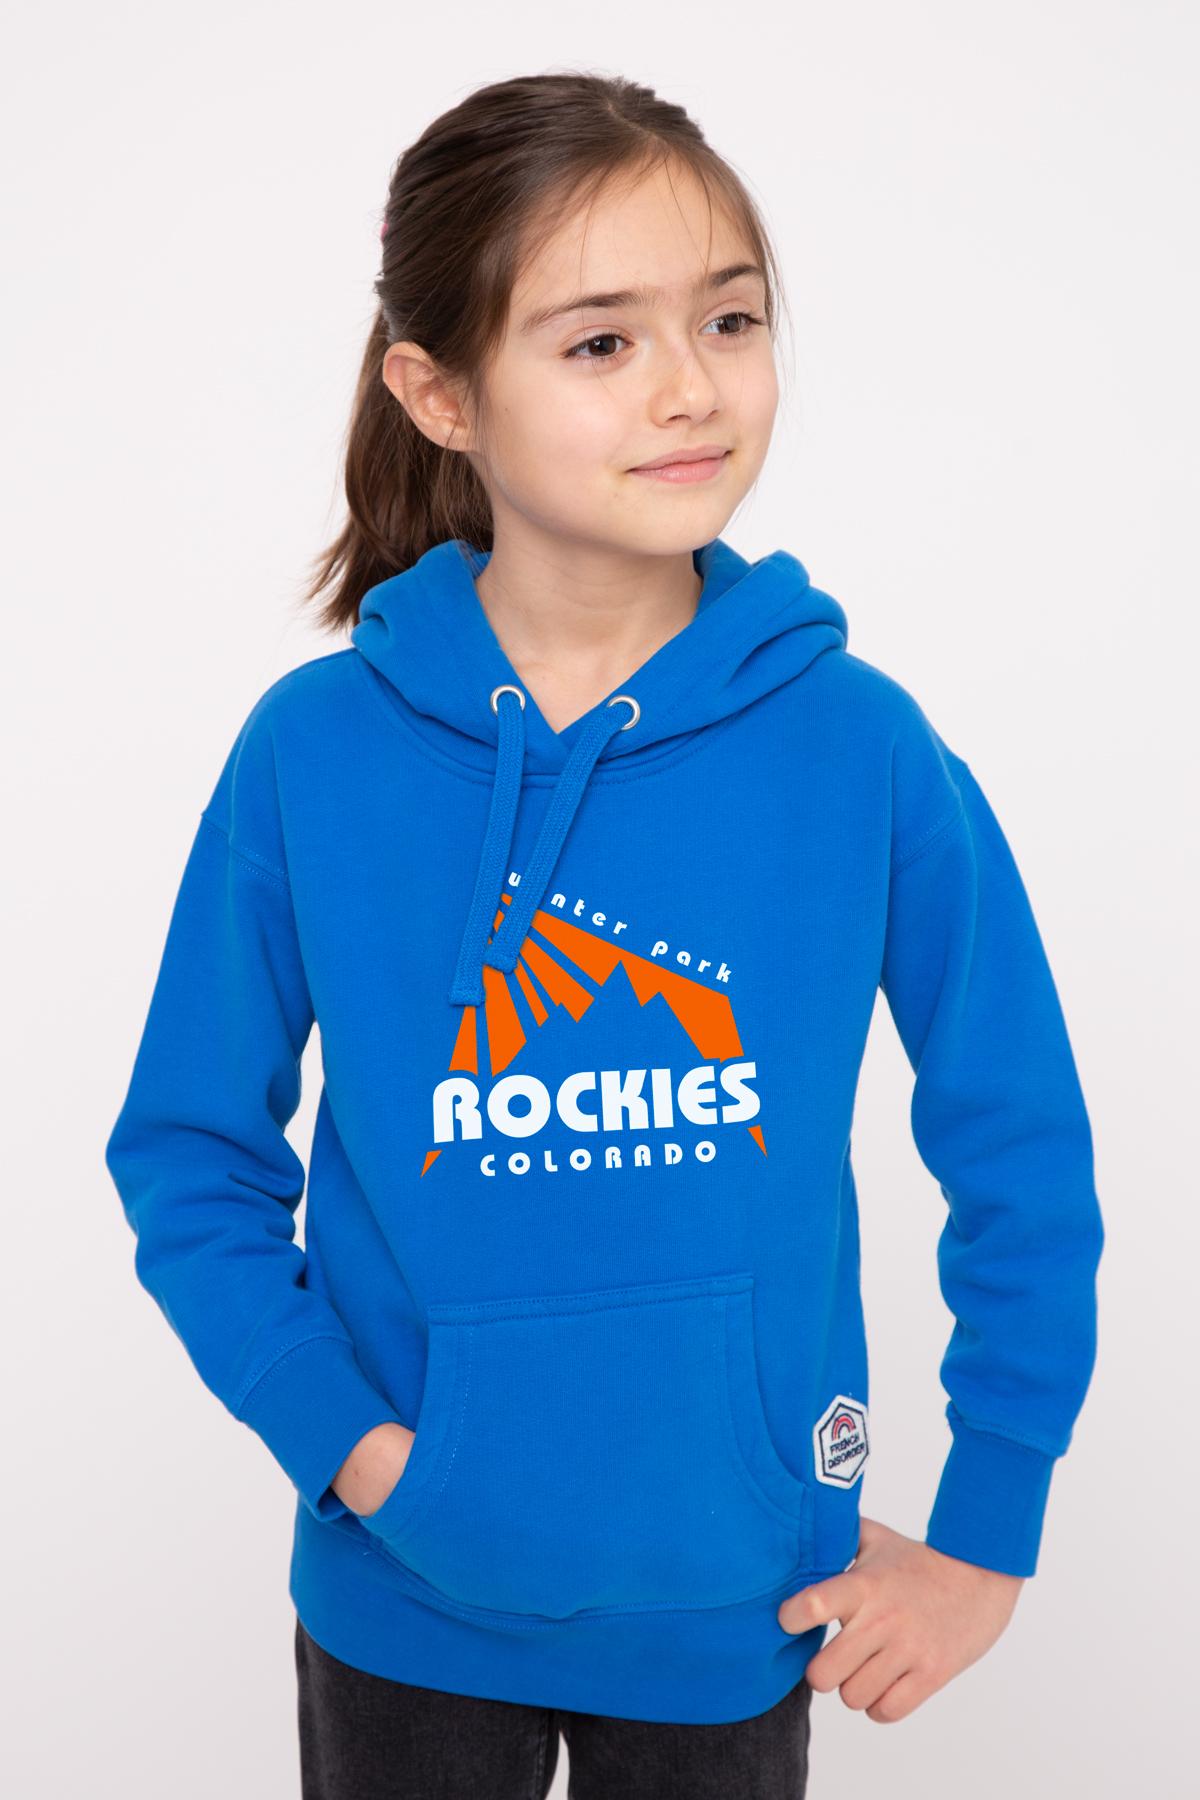 Photo de SWEATS À CAPUCHE Hoodie Kids ROCKIES chez French Disorder